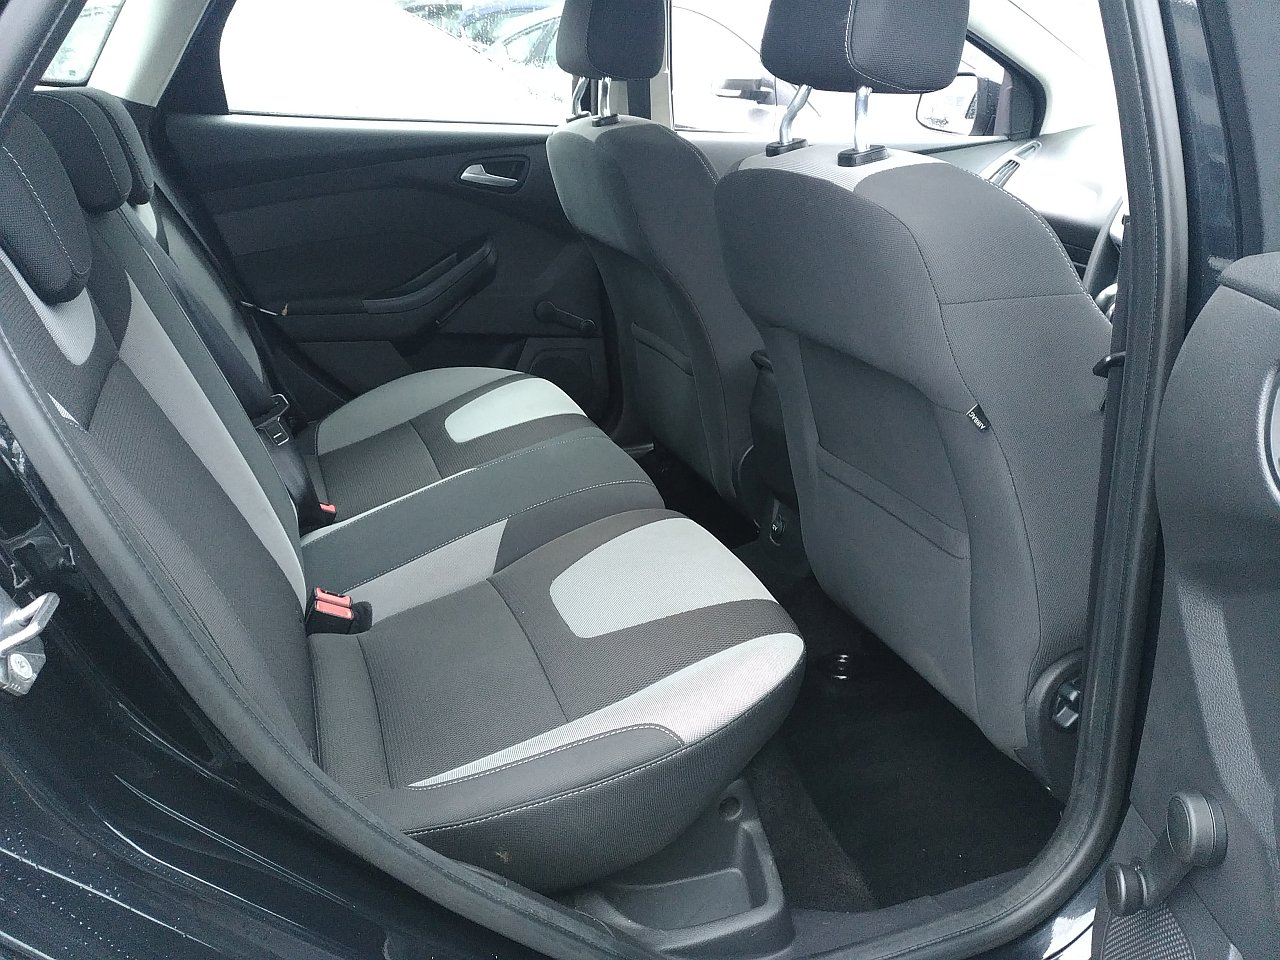 Ford Focus 2.0 TDCi 163 Zetec S 5dr Powershift image 10